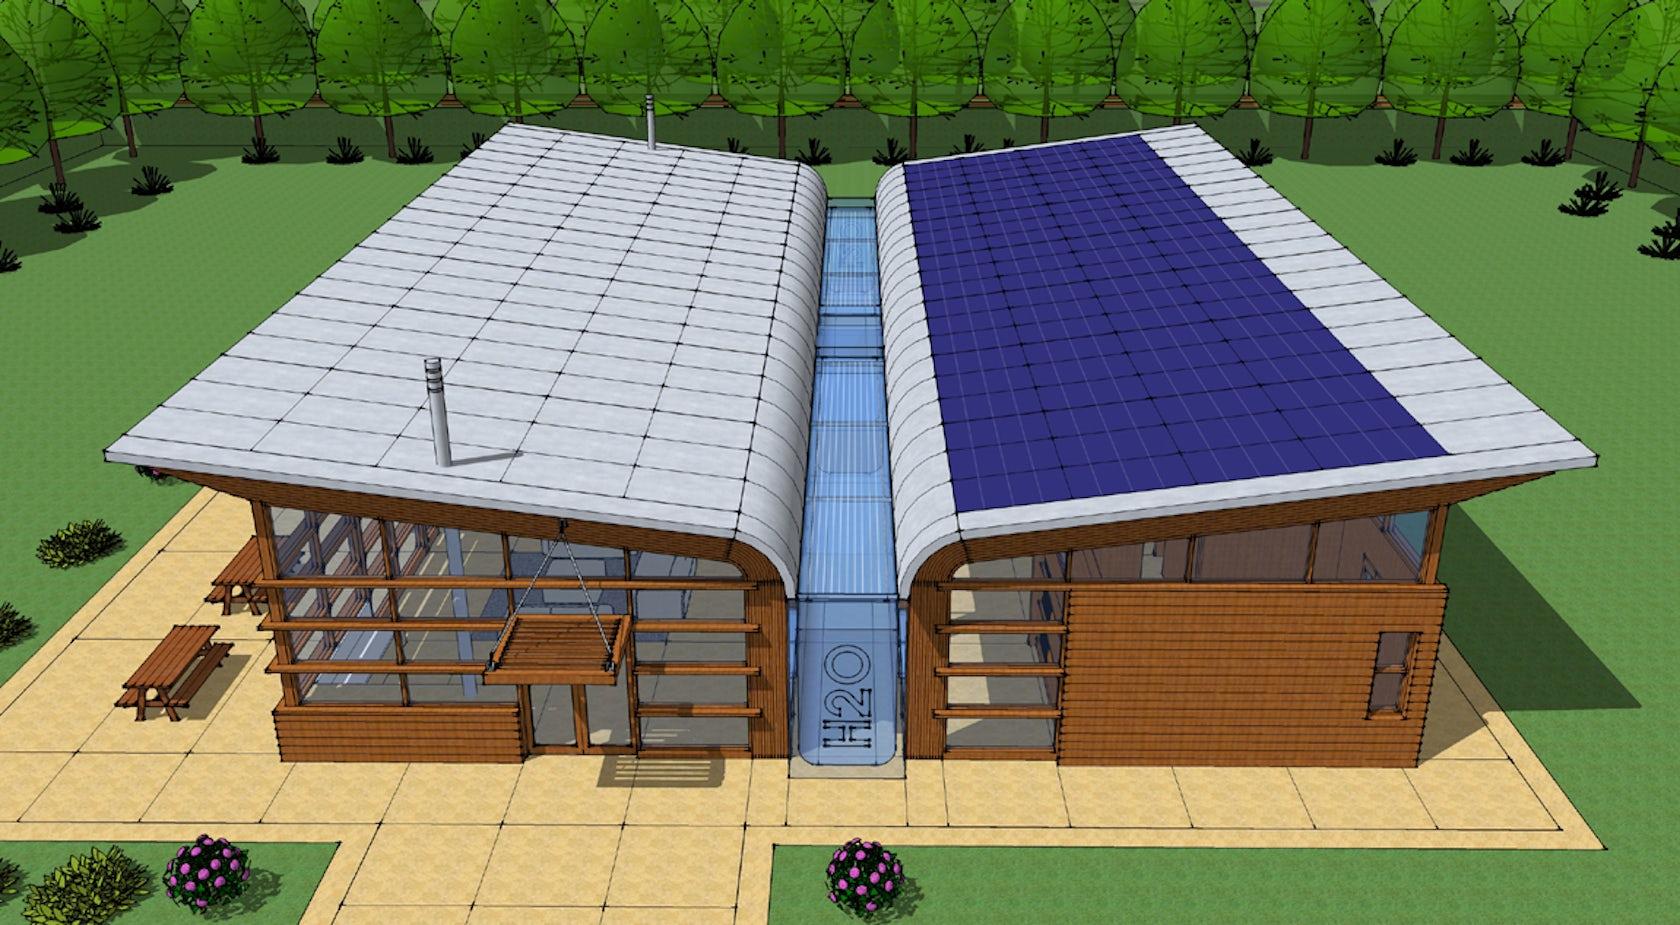 Rainwater and solar power harvesting system architizer for Rain harvesting system design